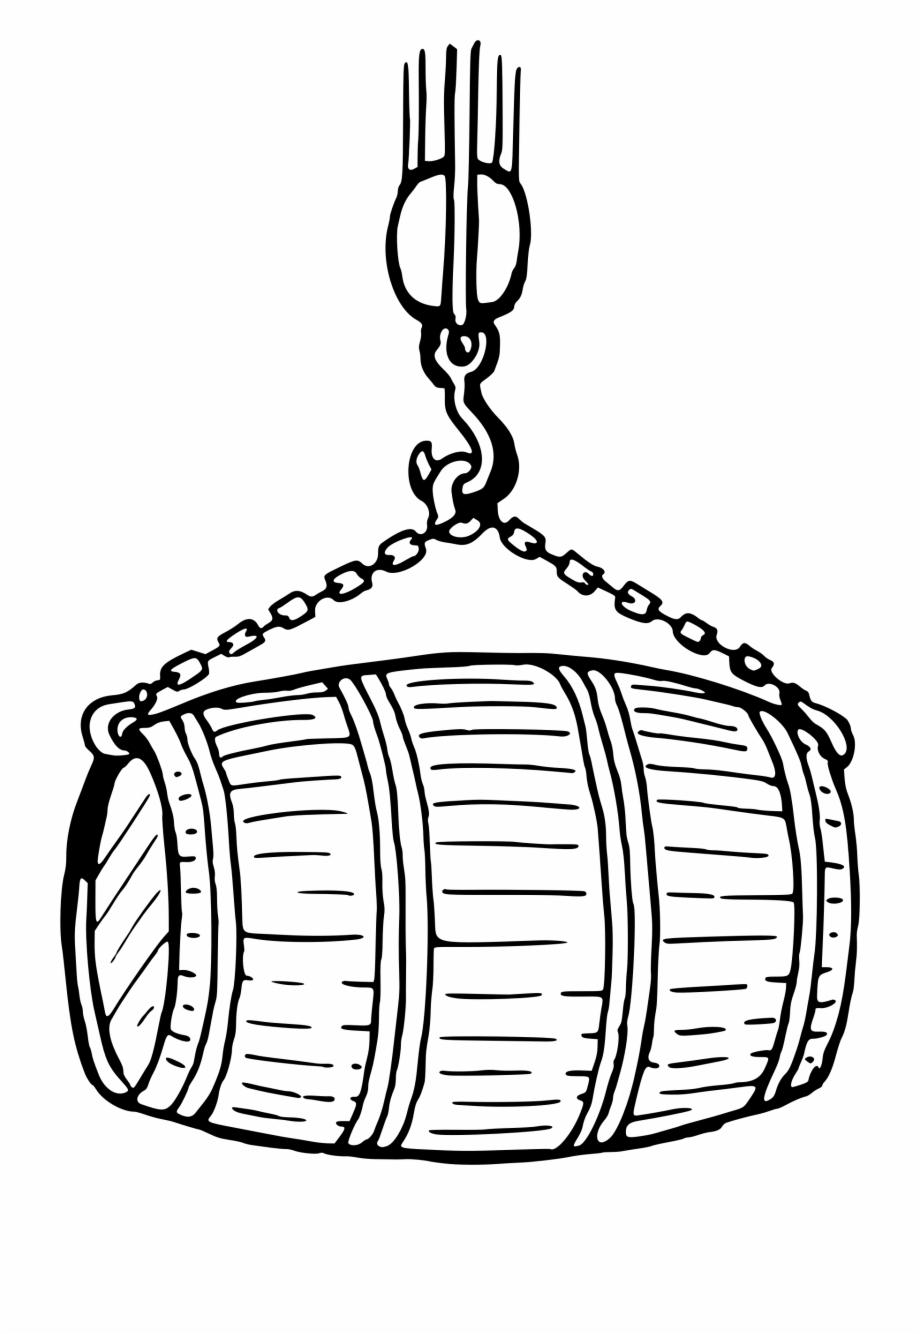 Barrel Clipart Black And White.